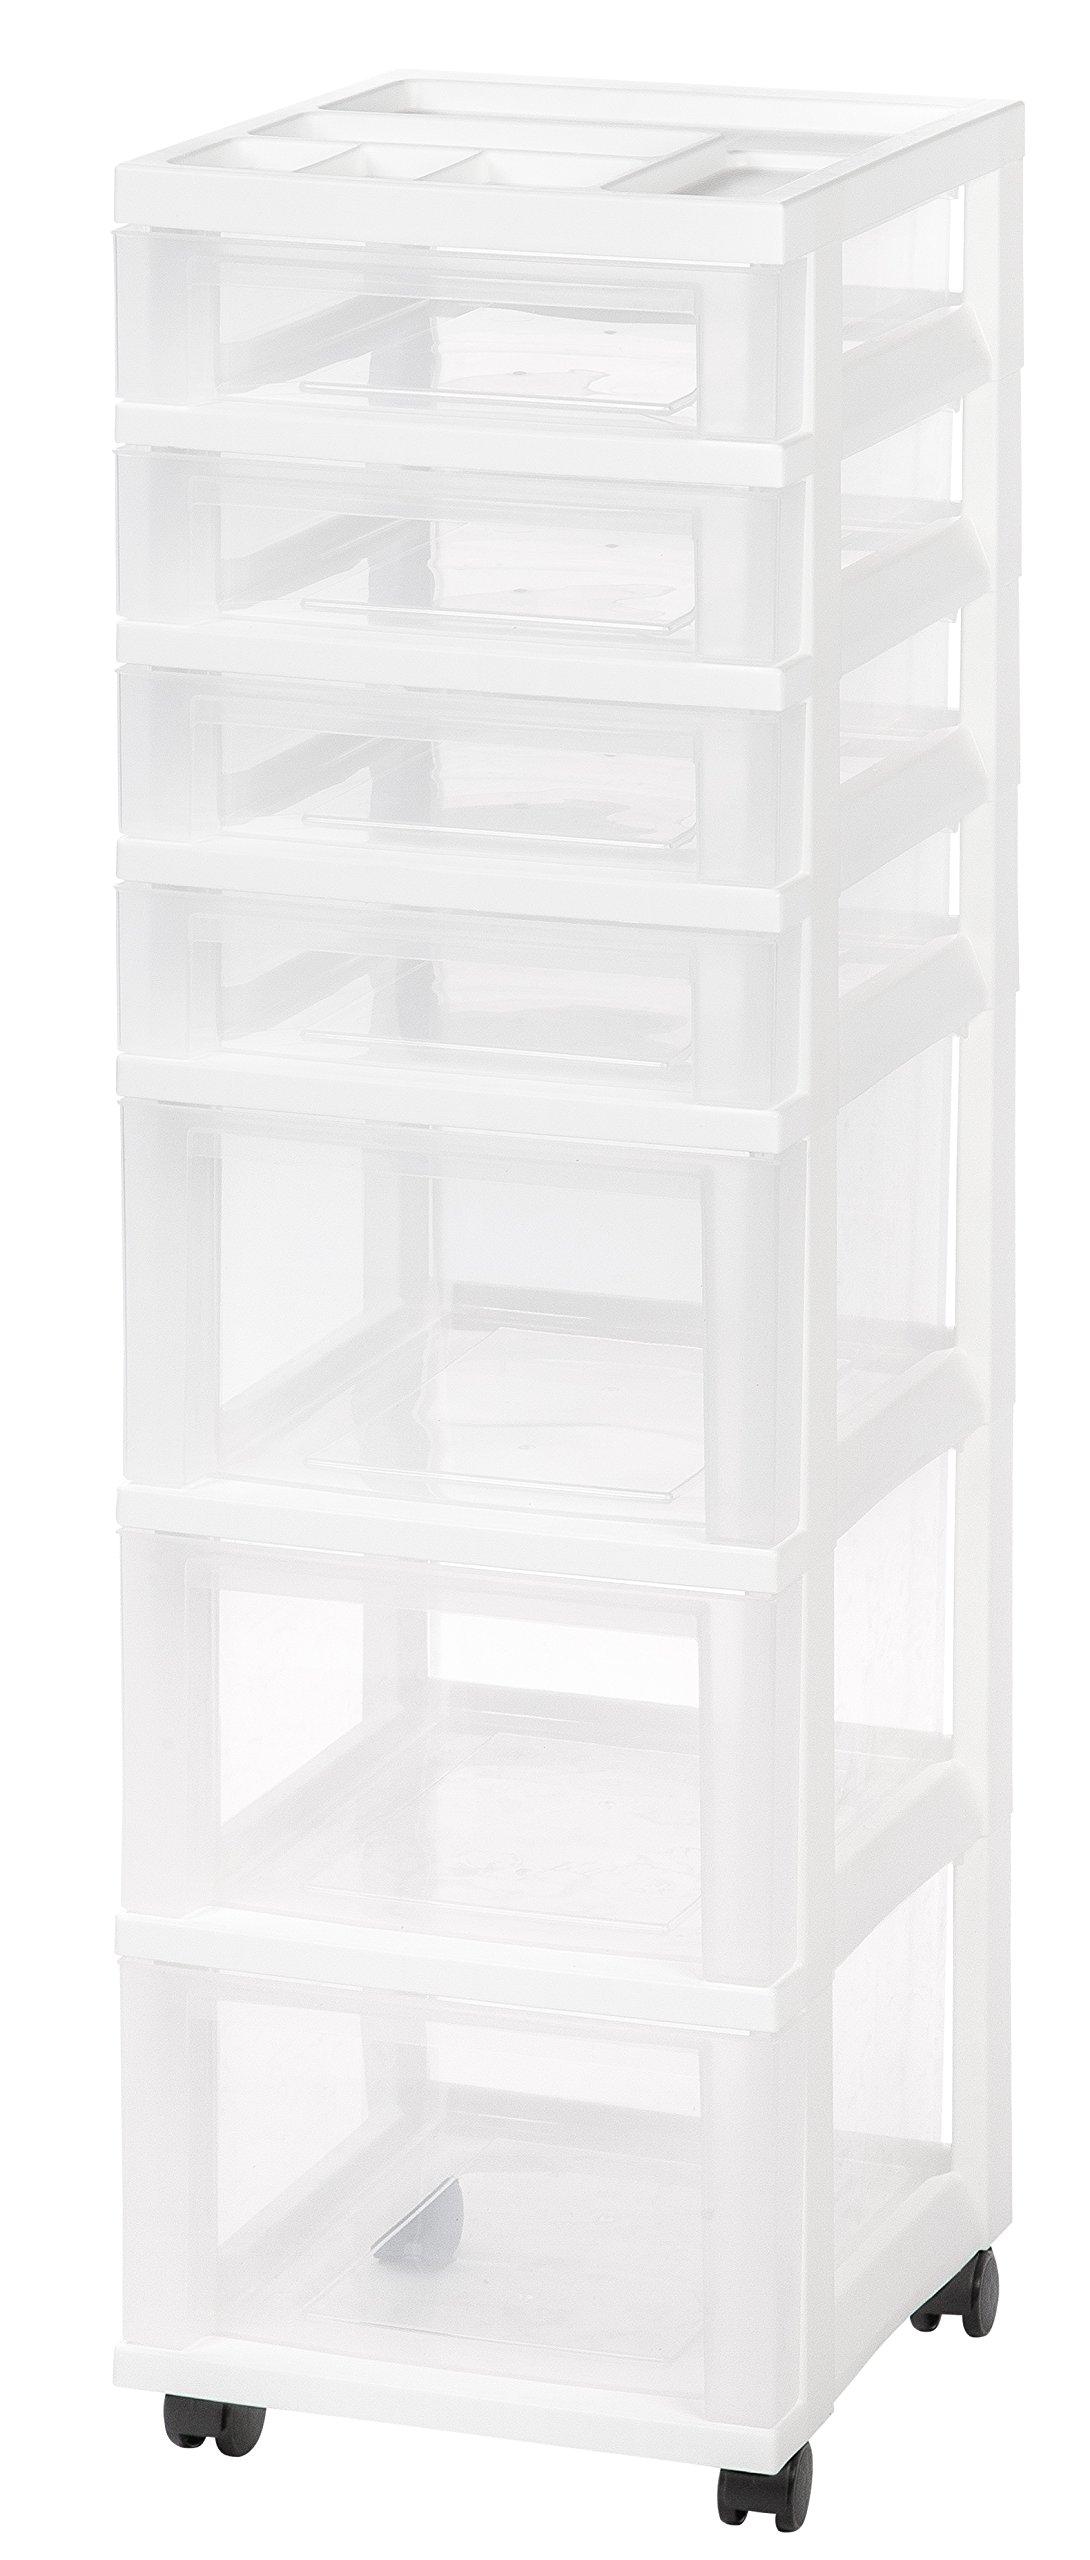 IRIS USA, Inc. IRIS Medium 7-Drawer Storage Cart W/Organizer, White